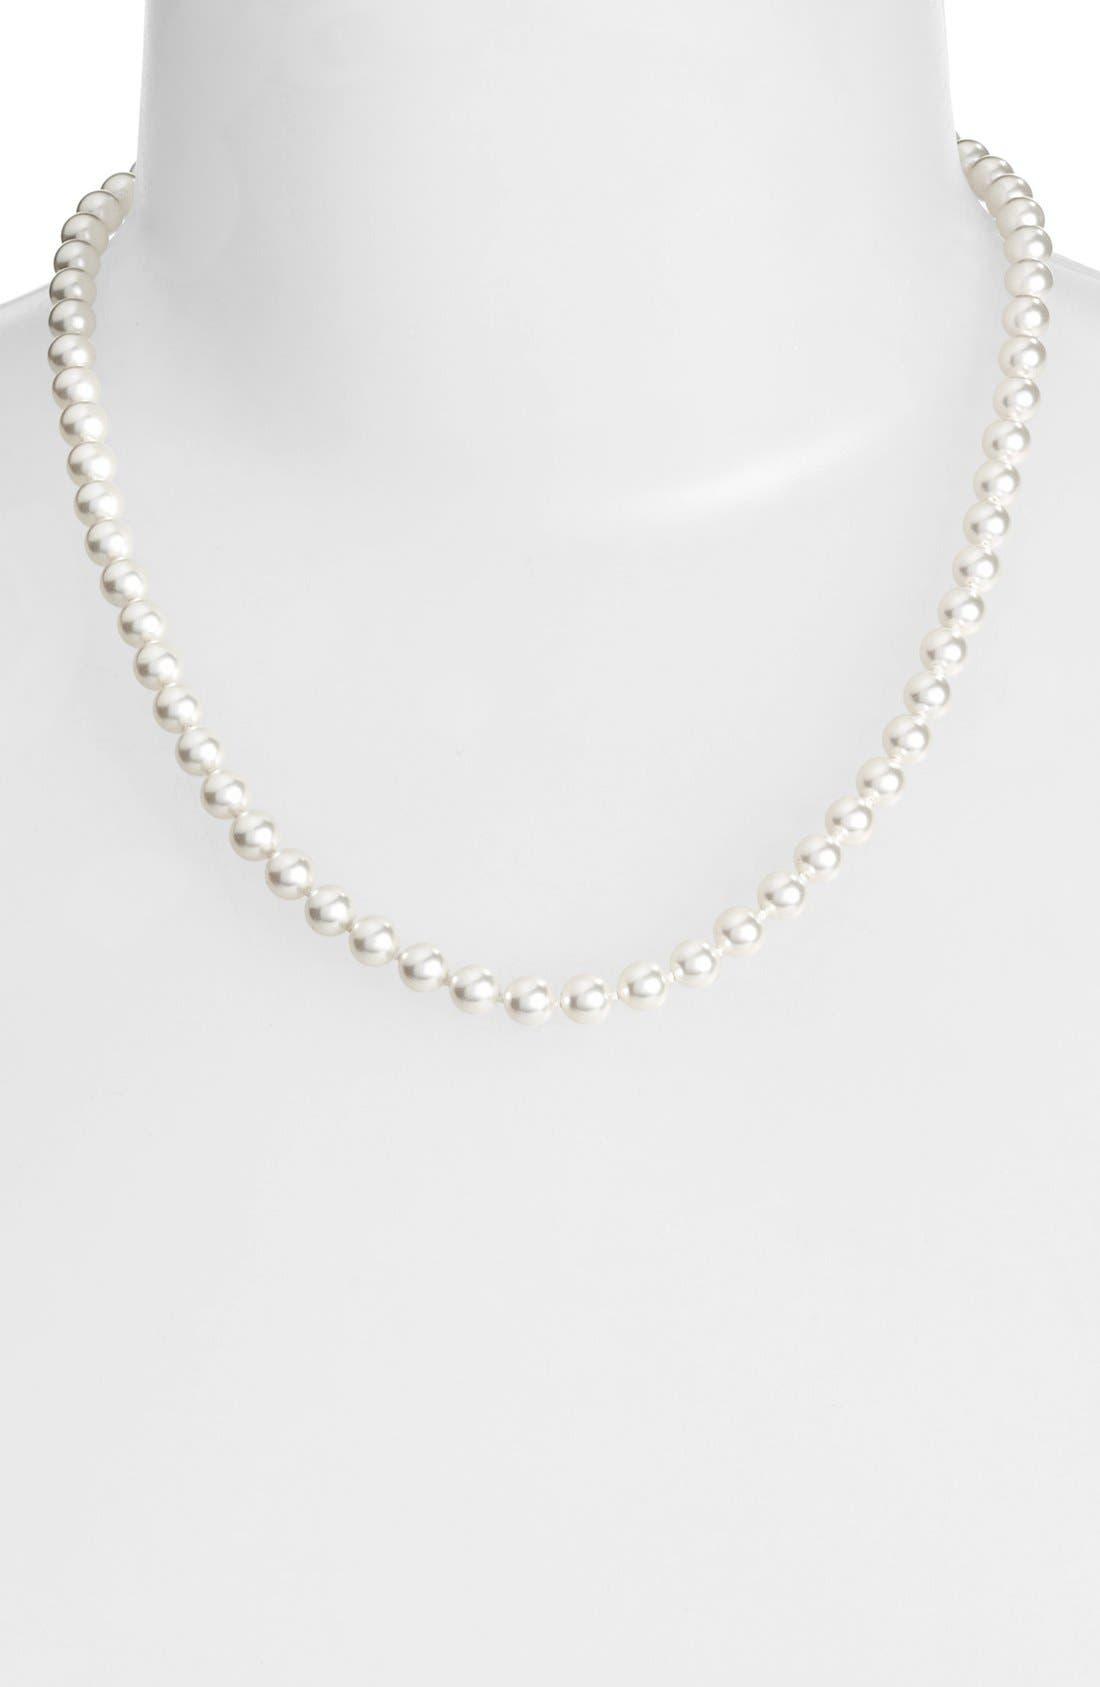 ImitationPearl Collar Necklace,                             Main thumbnail 1, color,                             Rhodium